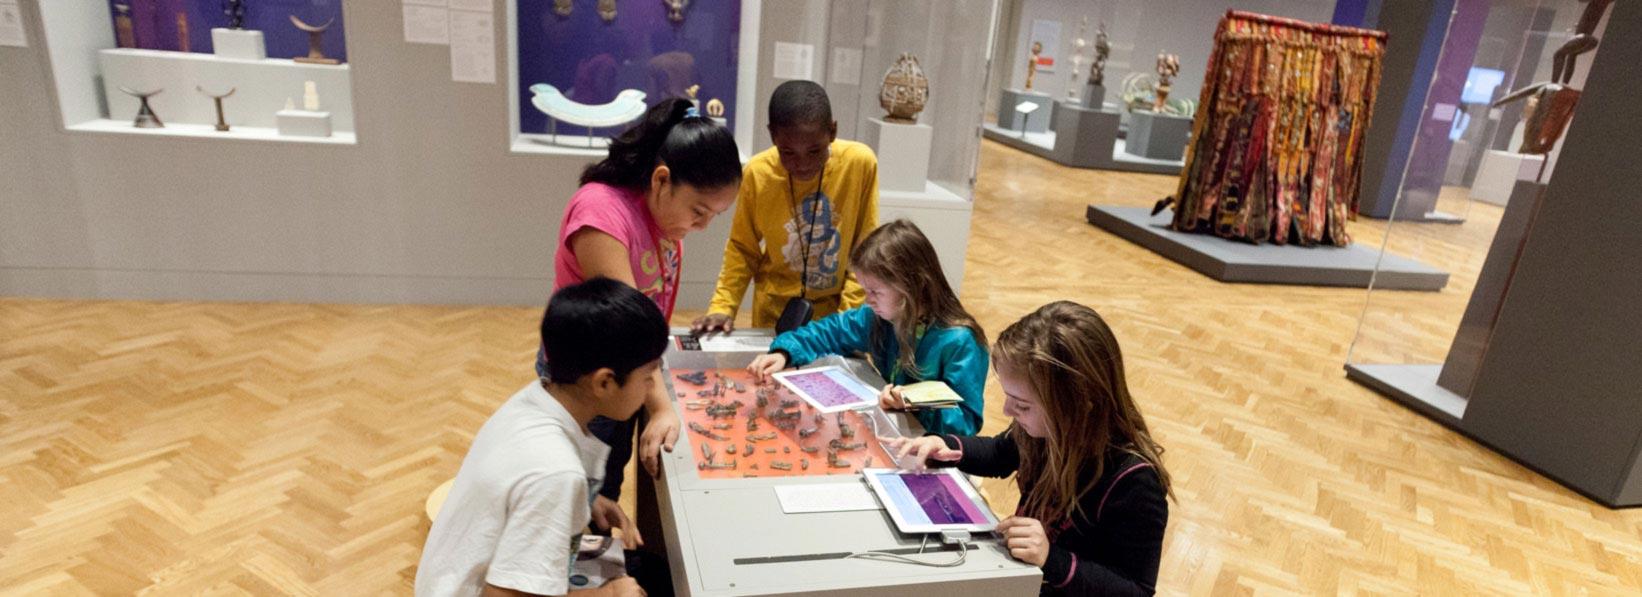 African Galleries